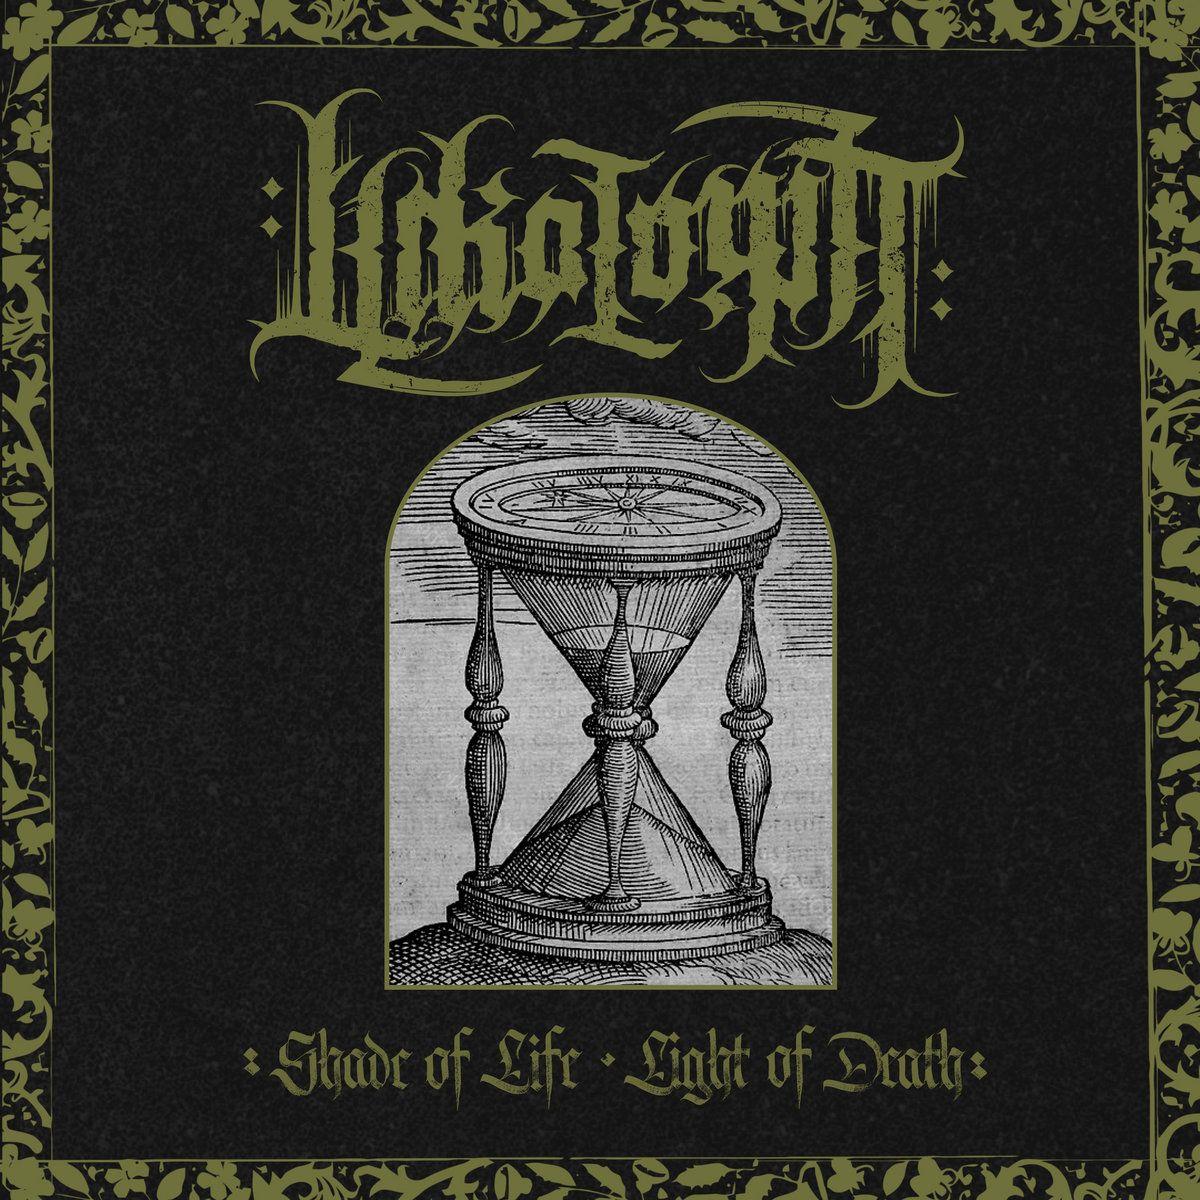 Hekatomb - Shade of Life. Light of Death